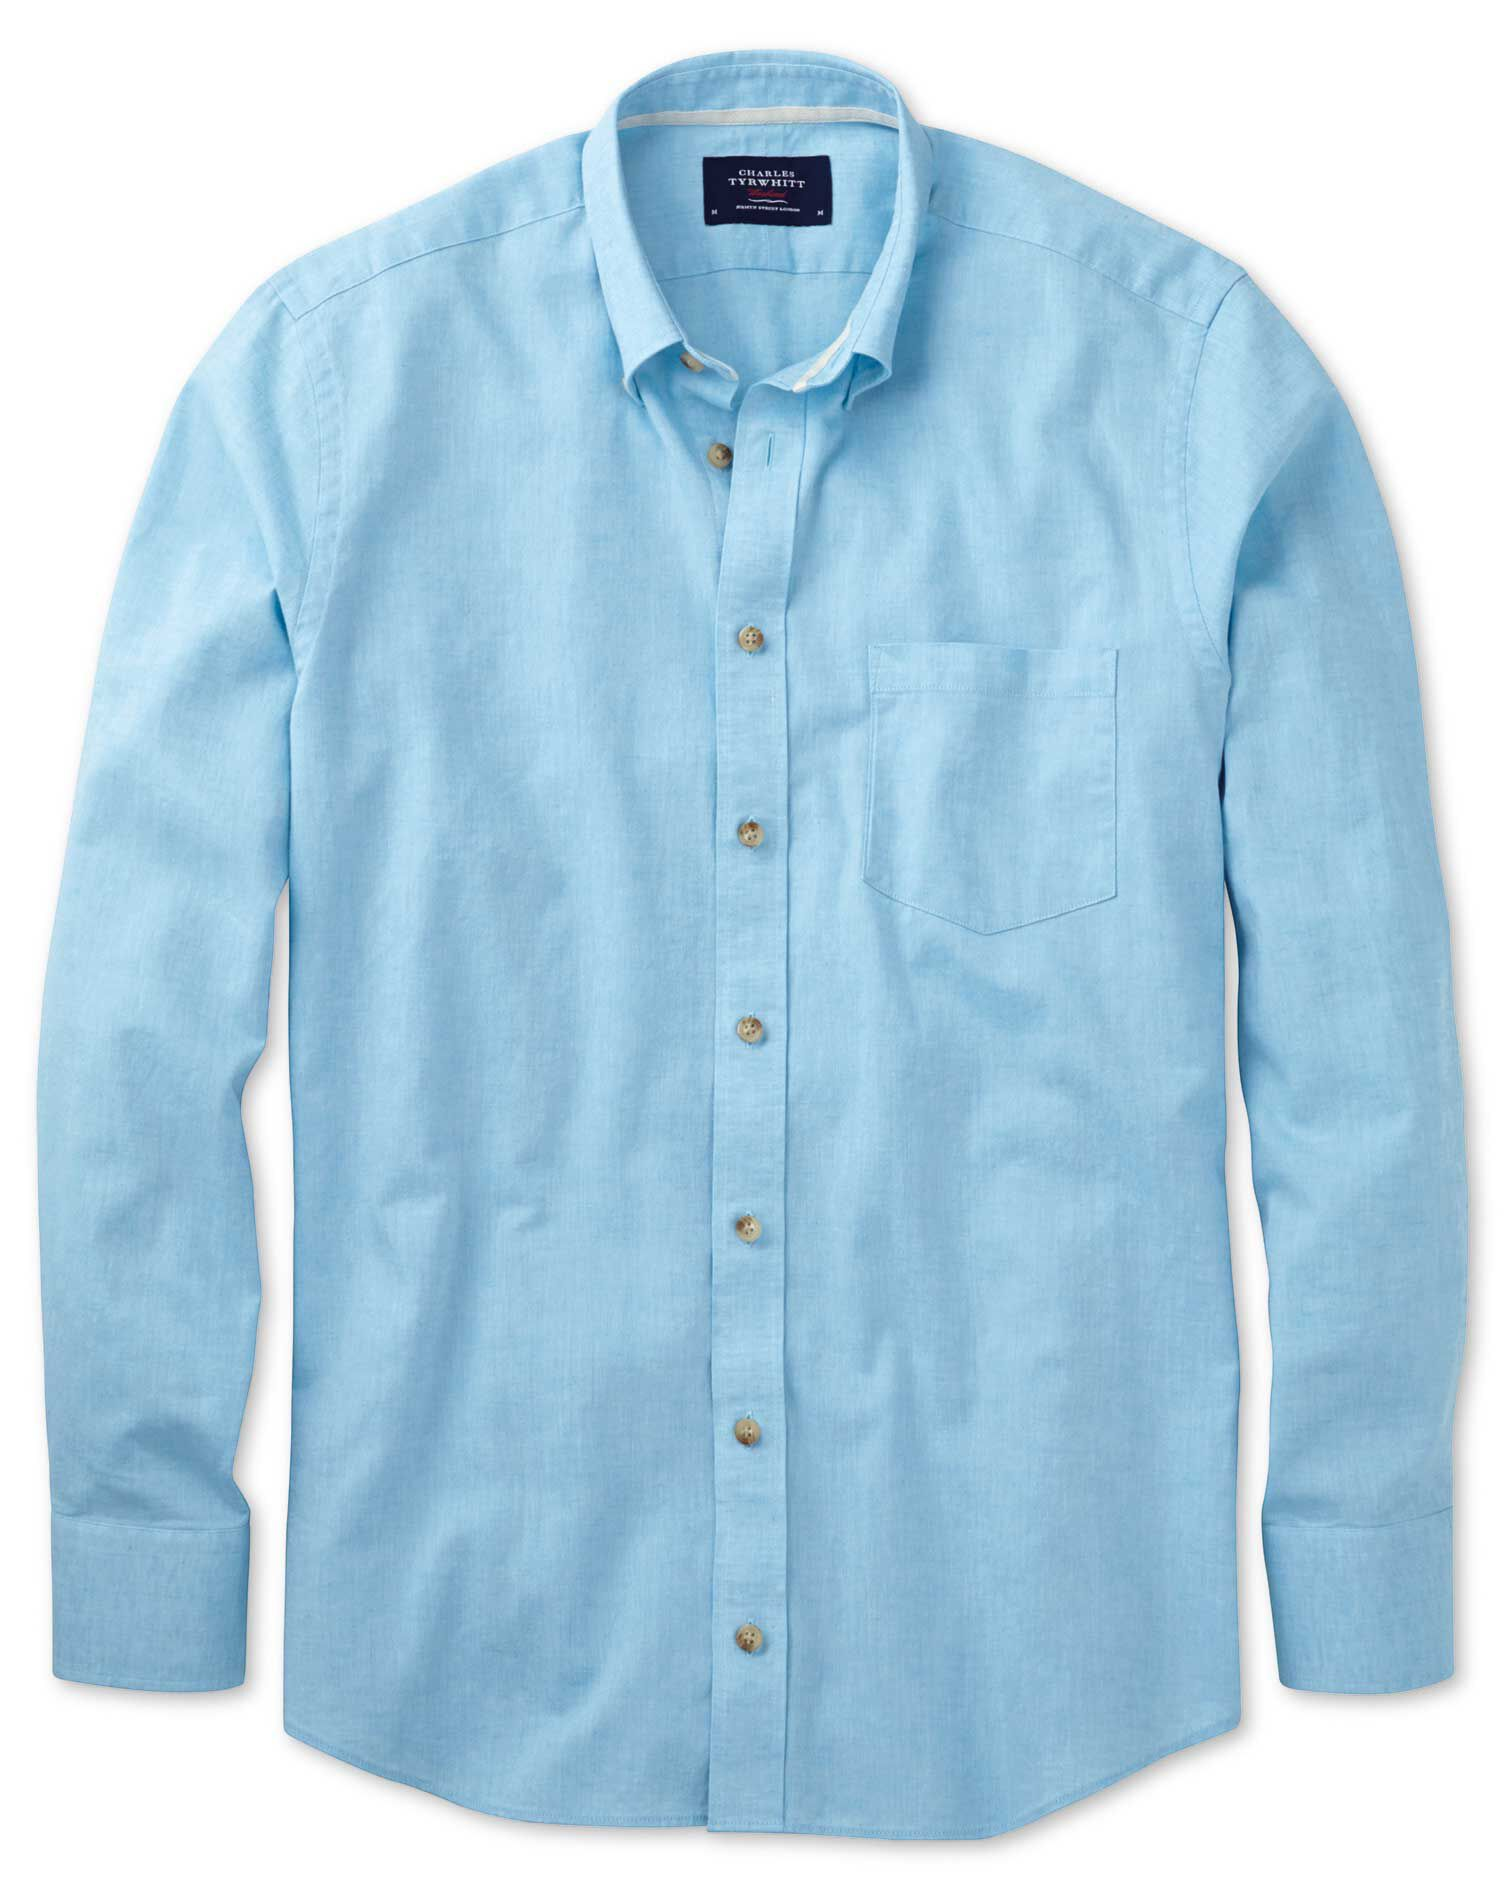 Slim Fit Aqua Blue Cotton Shirt Single Cuff Size XL by Charles Tyrwhitt